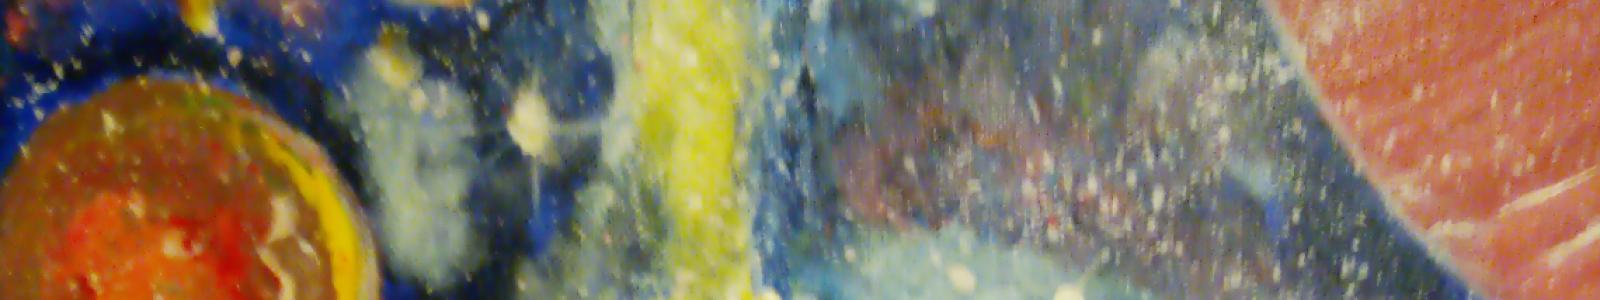 Gallery Painter Svetlana Danilova